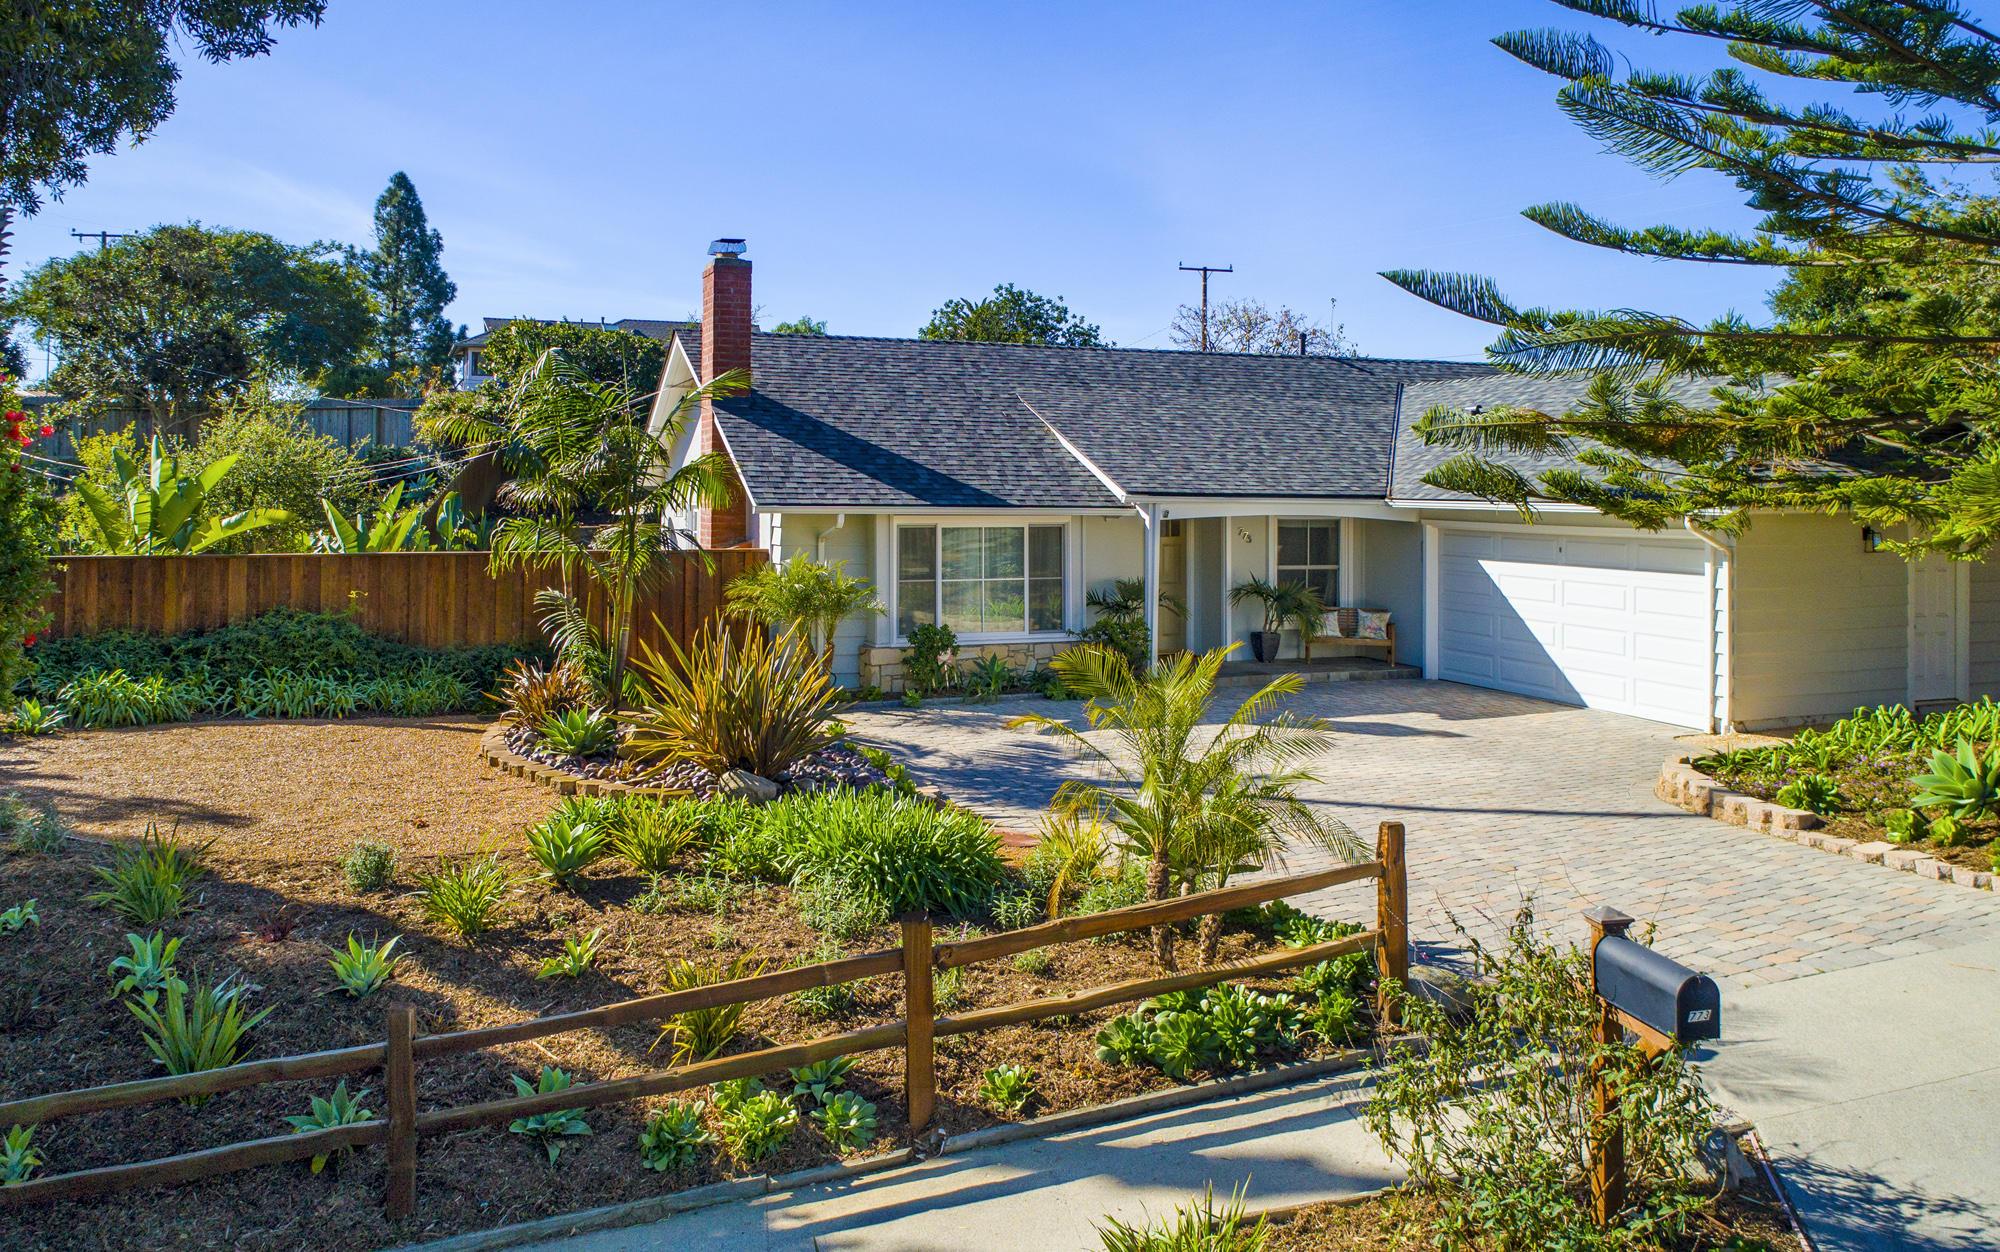 Property photo for 773 Westwood Dr Santa Barbara, California 93109 - 18-315